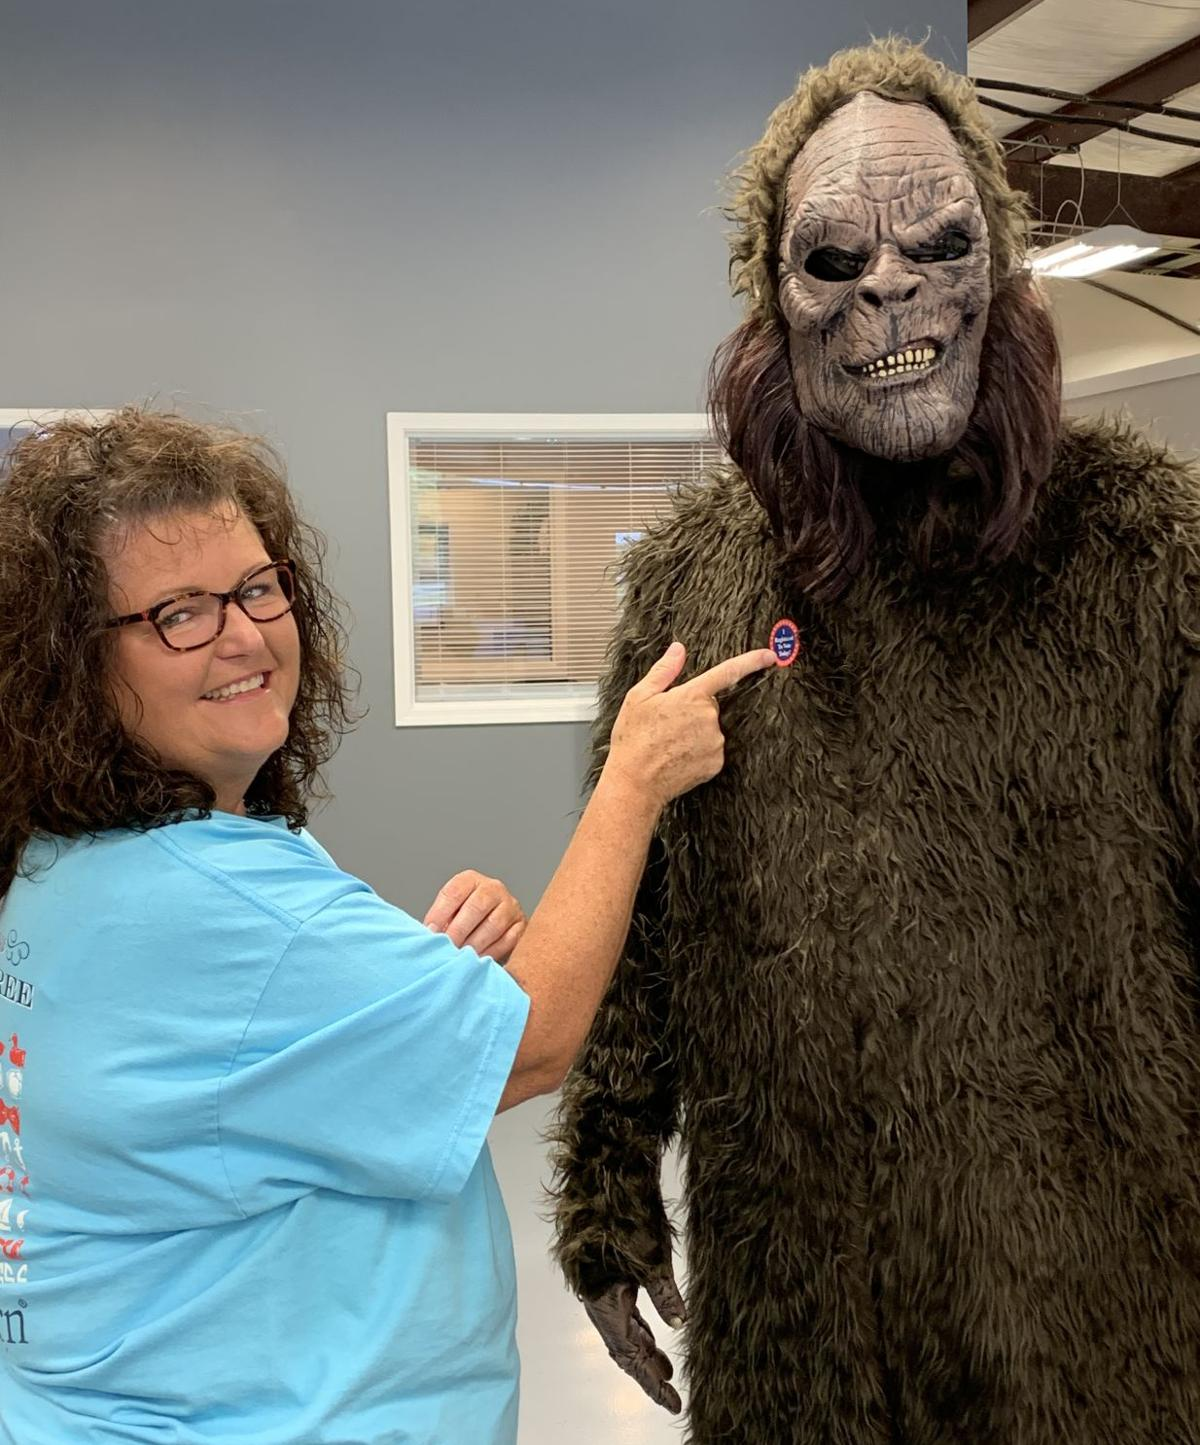 Citizen Bigfoot 'registers' to vote ahead of festival